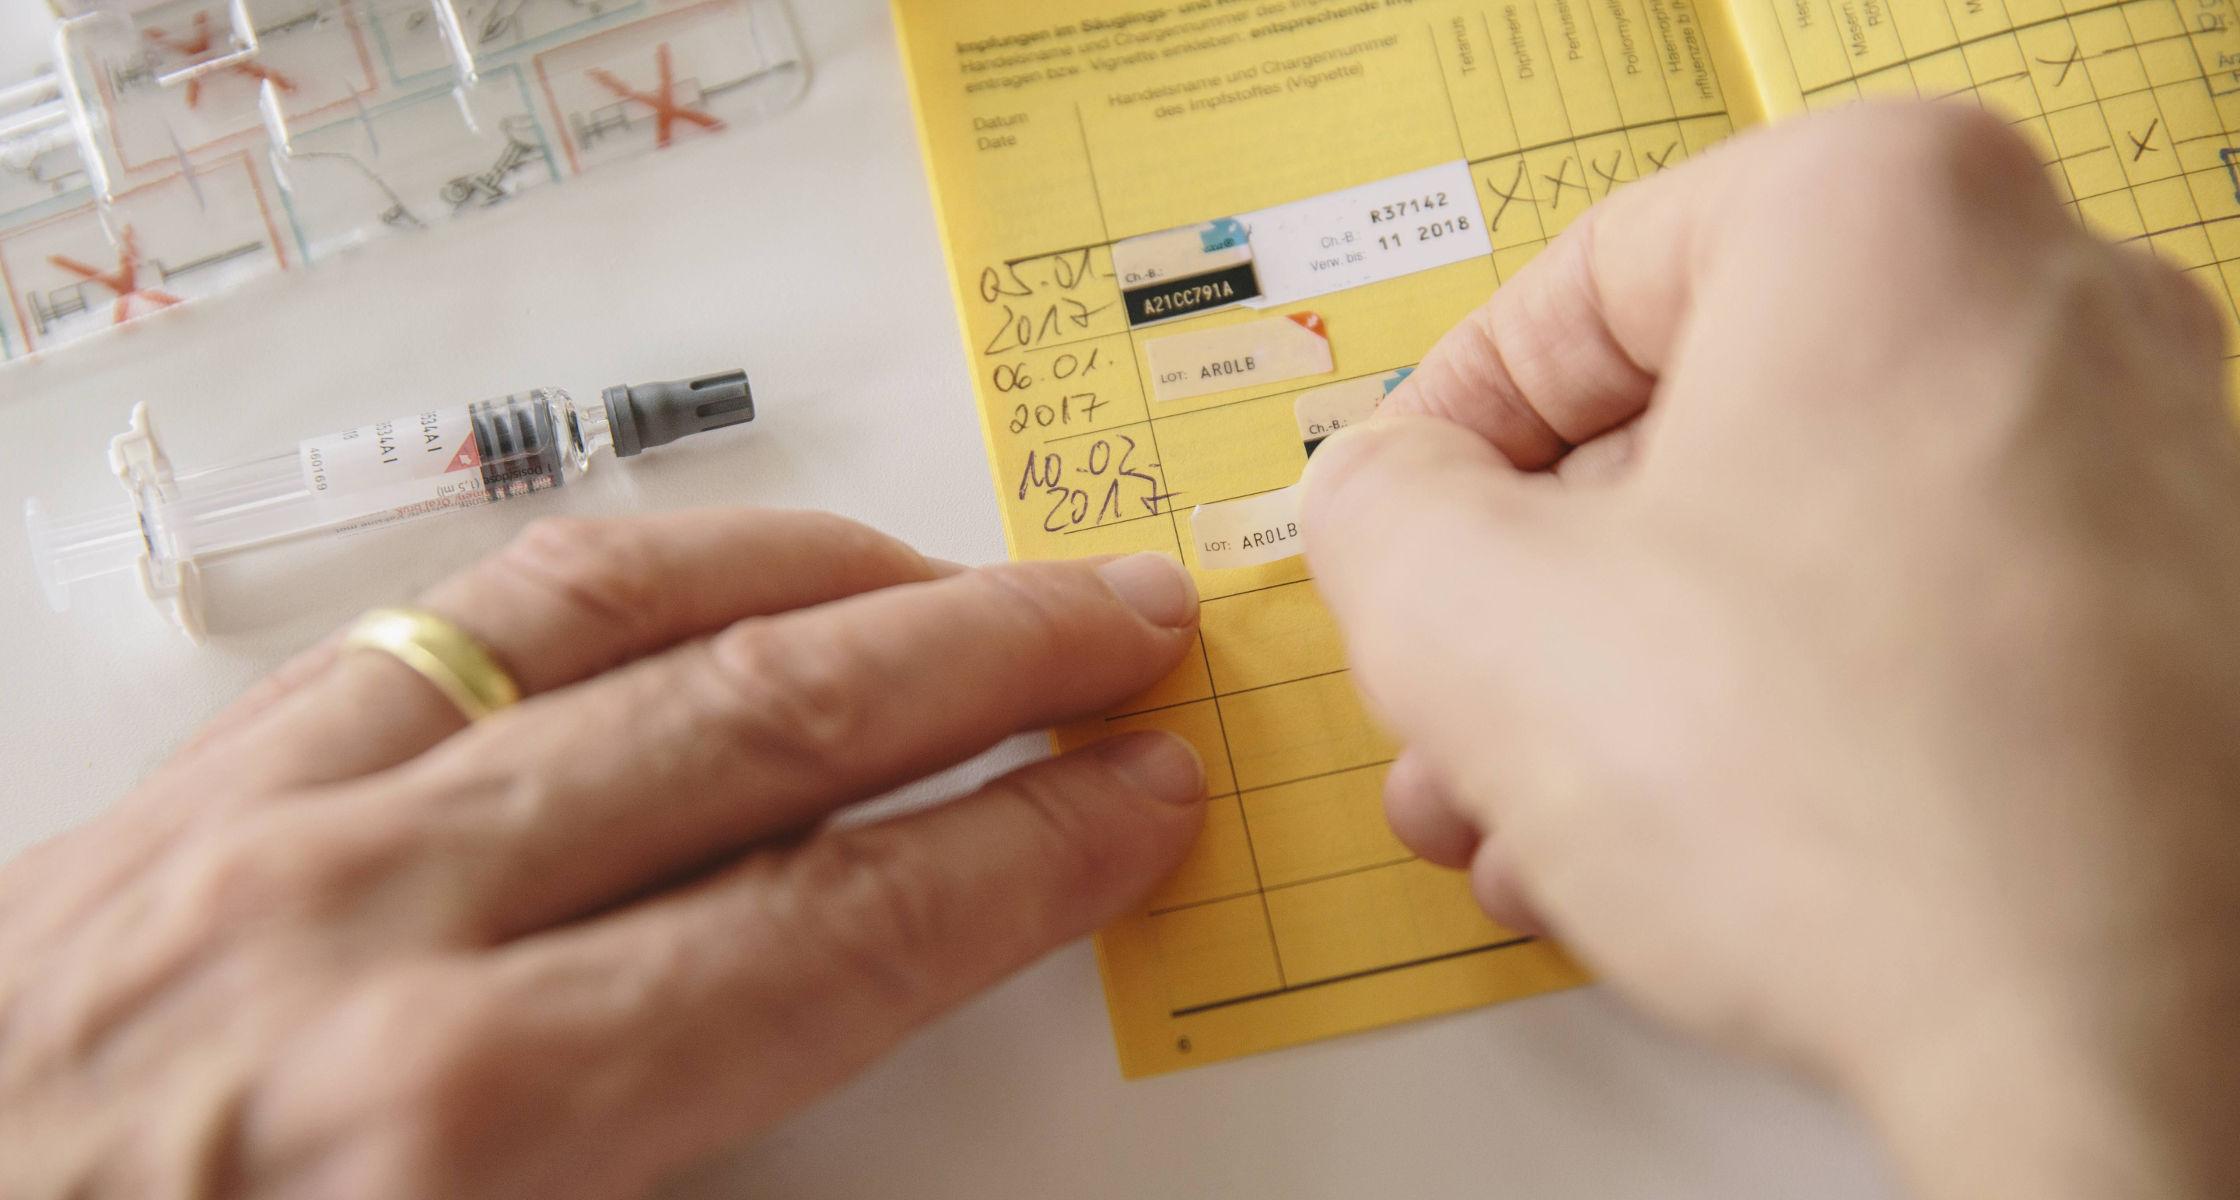 hpv impfung jungen abrechnungsziffer)